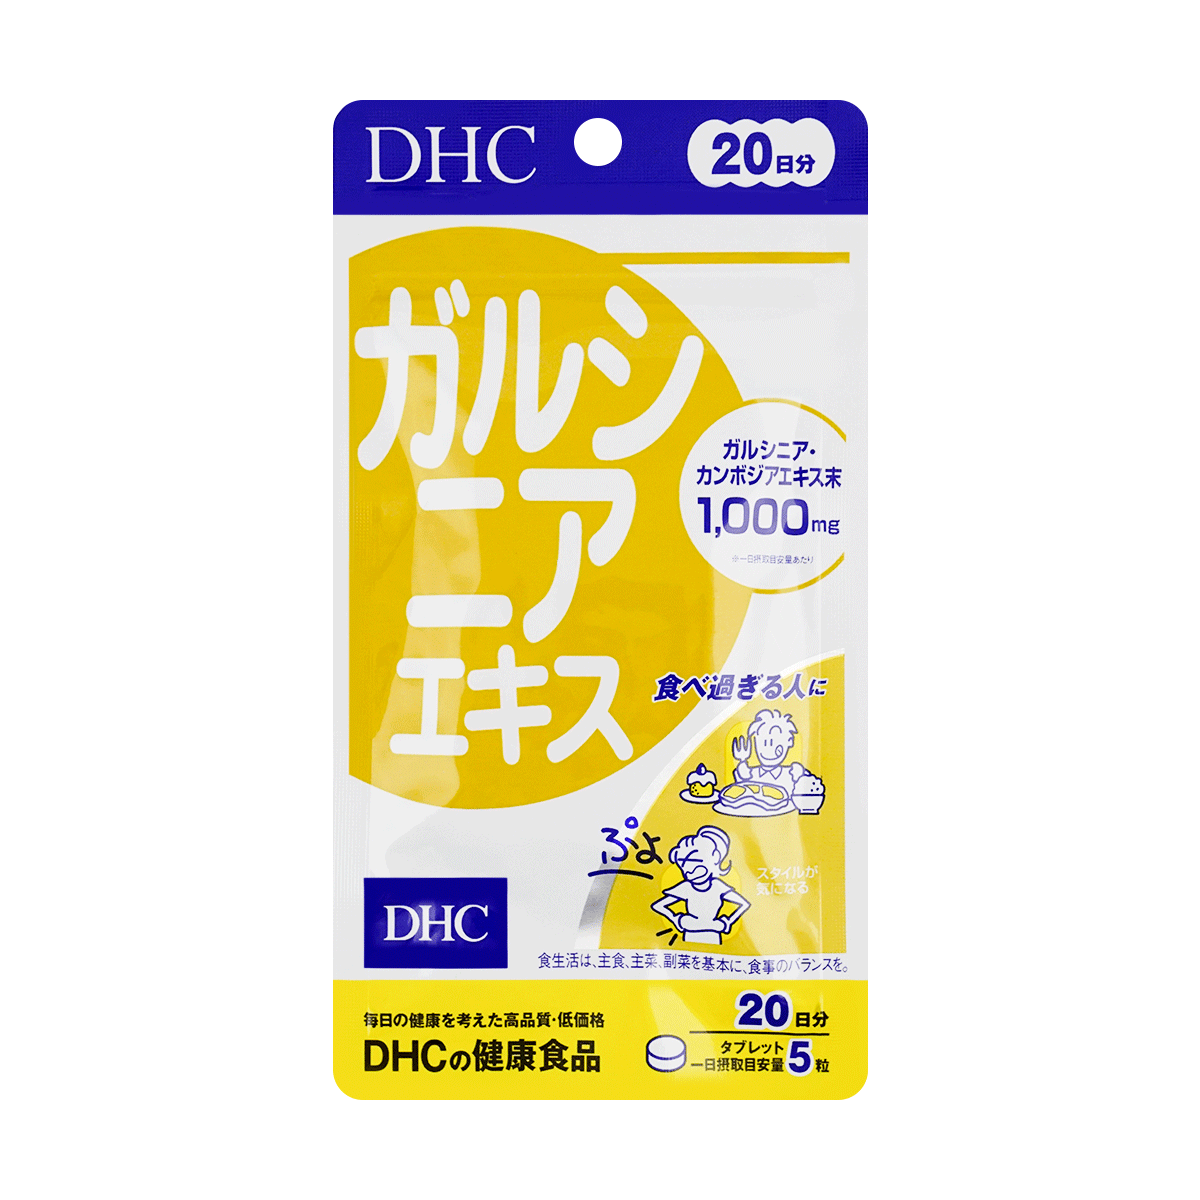 Yamibuy.com:Customer reviews:DHC Waist Slimming Vitamins 100 Tablets